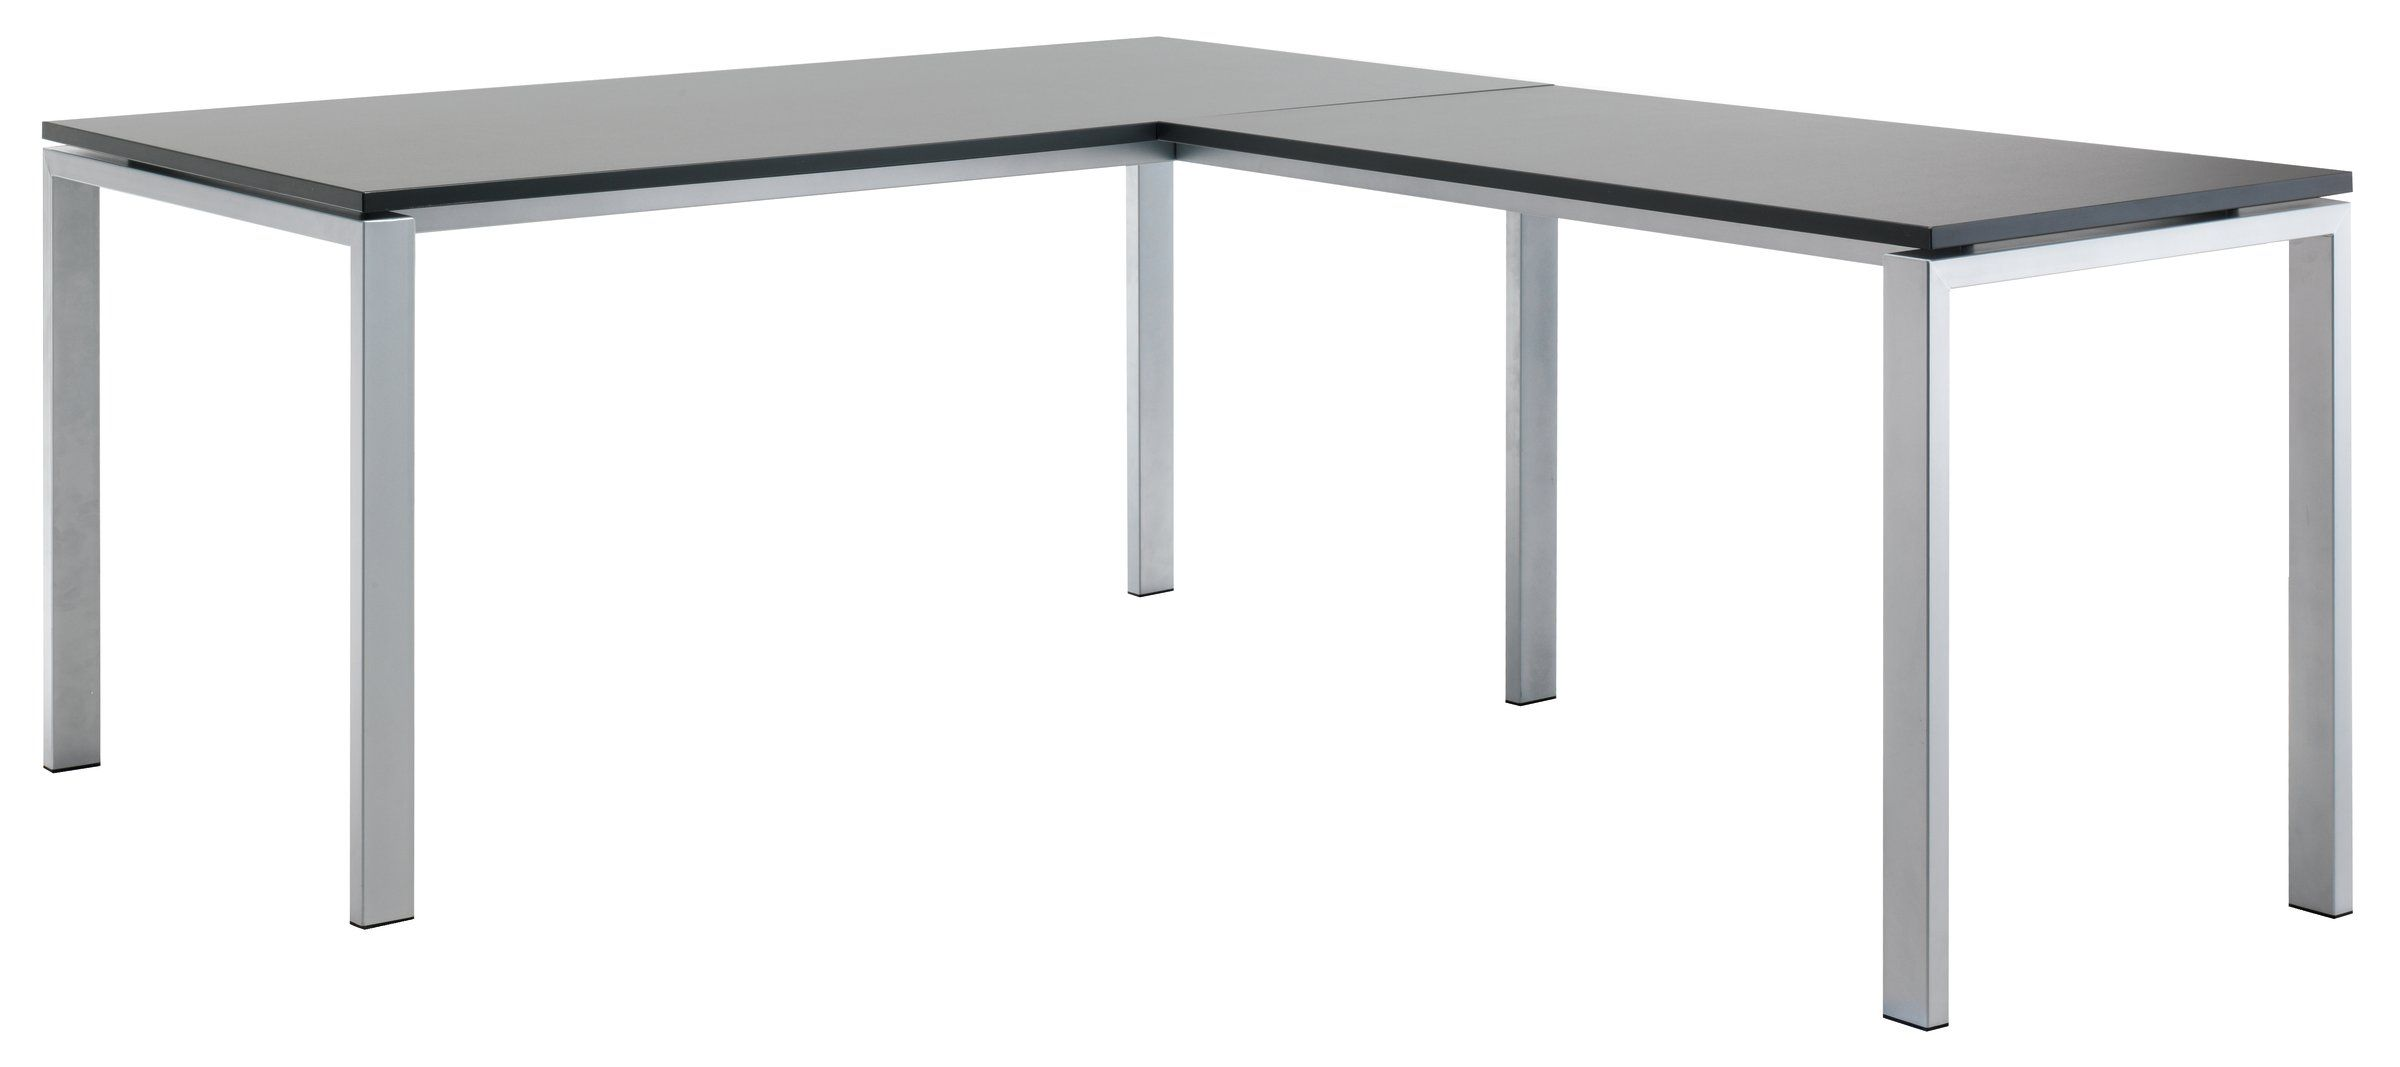 Concept X Zimmer Norina Furniture Home Decor Und Decor